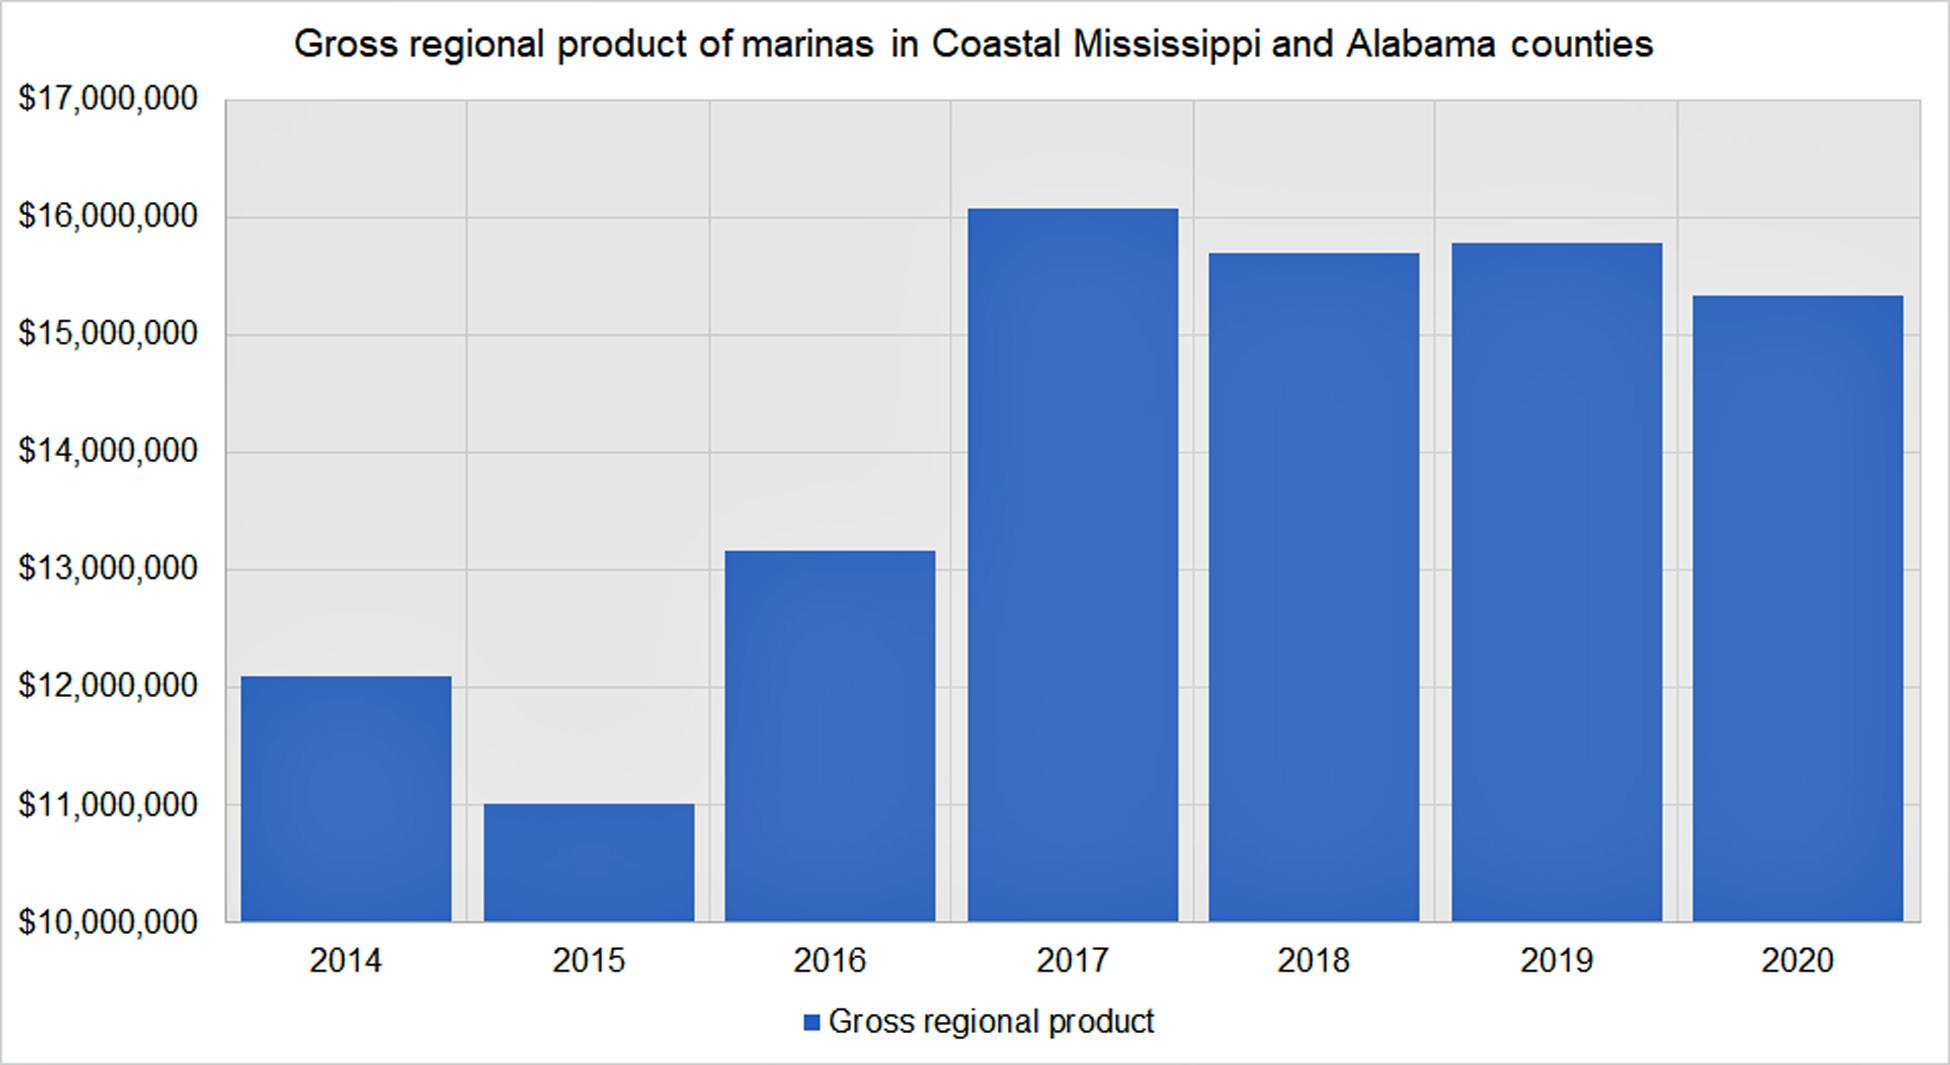 gross_regional_product_of_marinas_in_coastal_ms_and_al.jpg